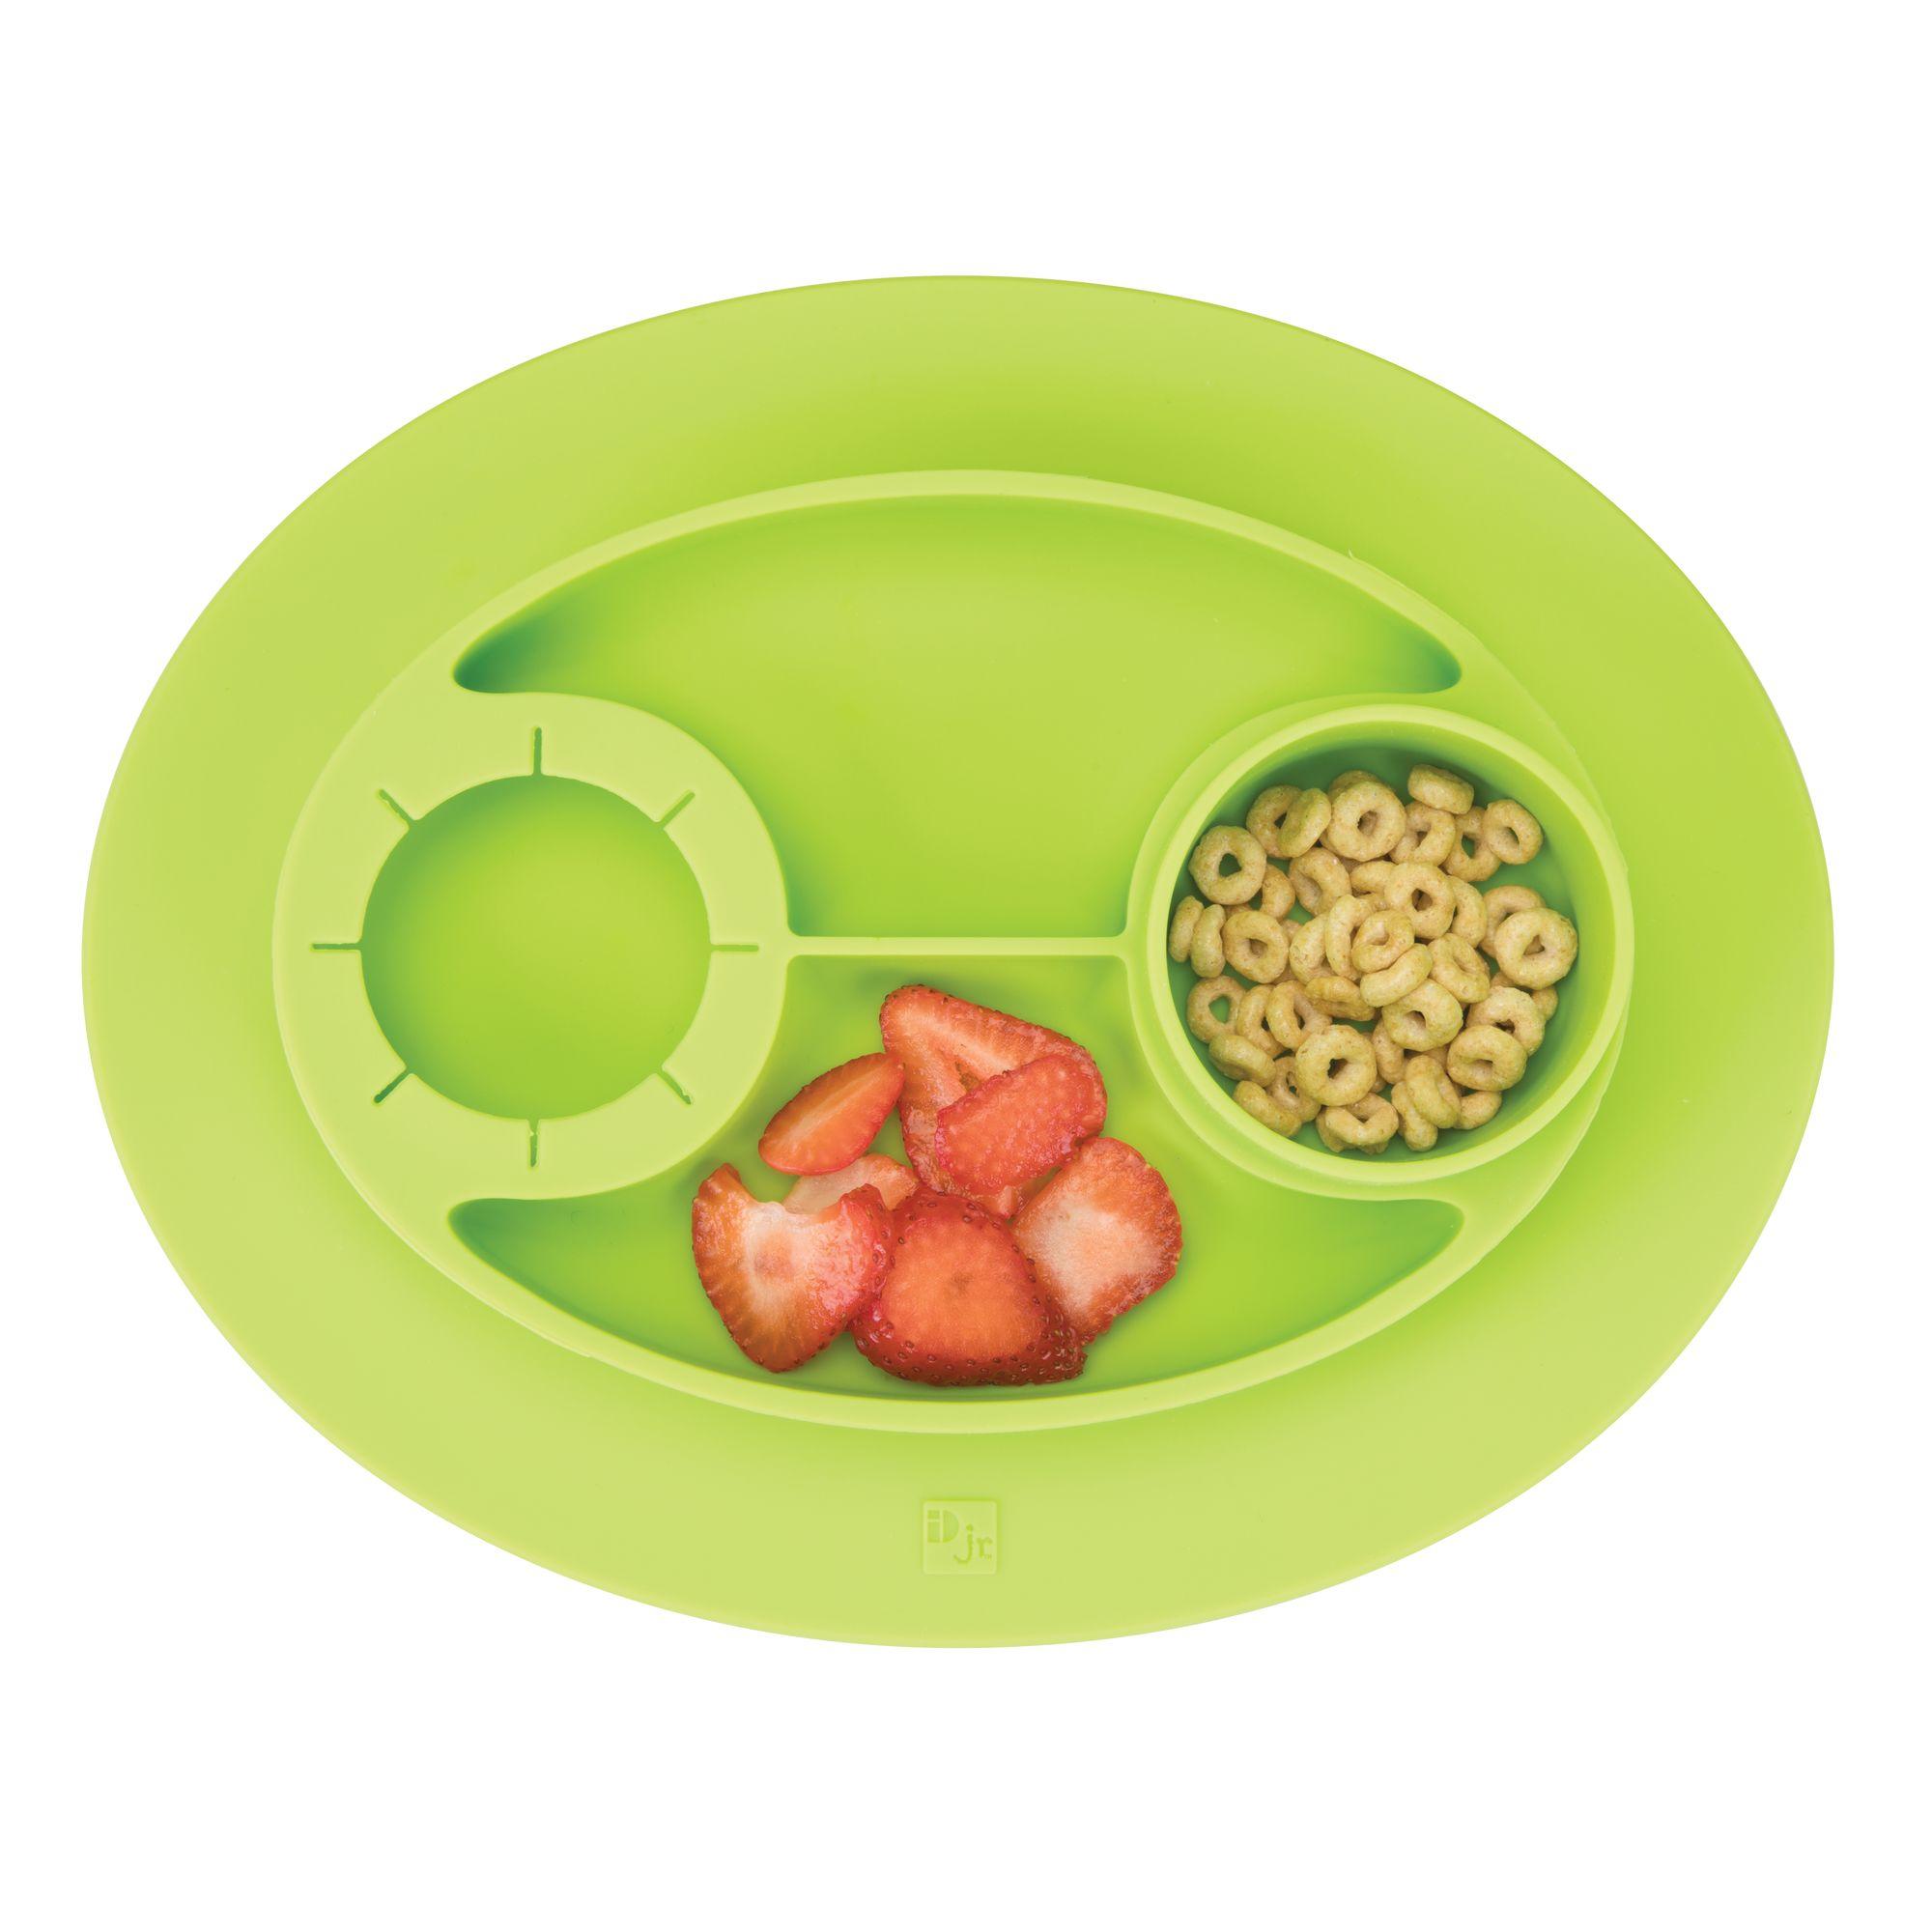 InterDesign Non-slip Silicone Mini Oval Placemat, Lime Green